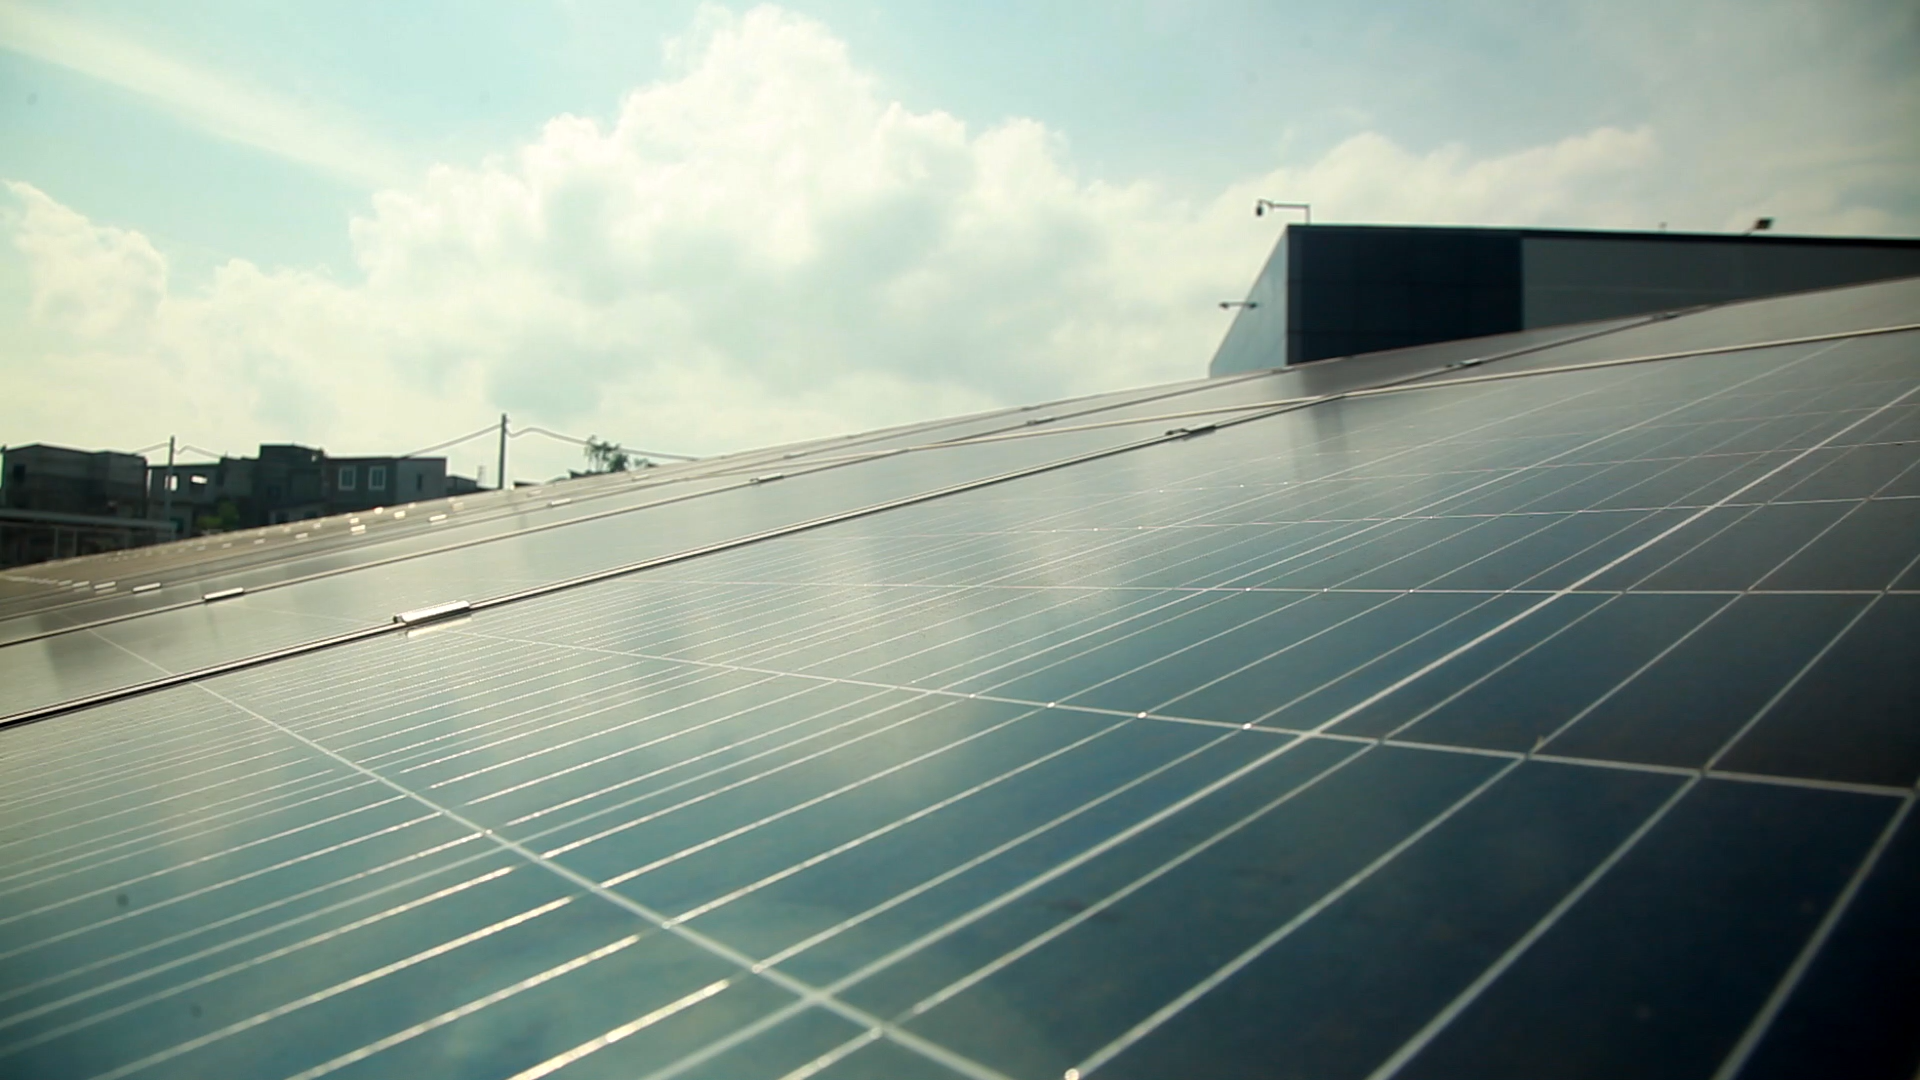 Renewables, flexible generation key to power sector modernization – experts